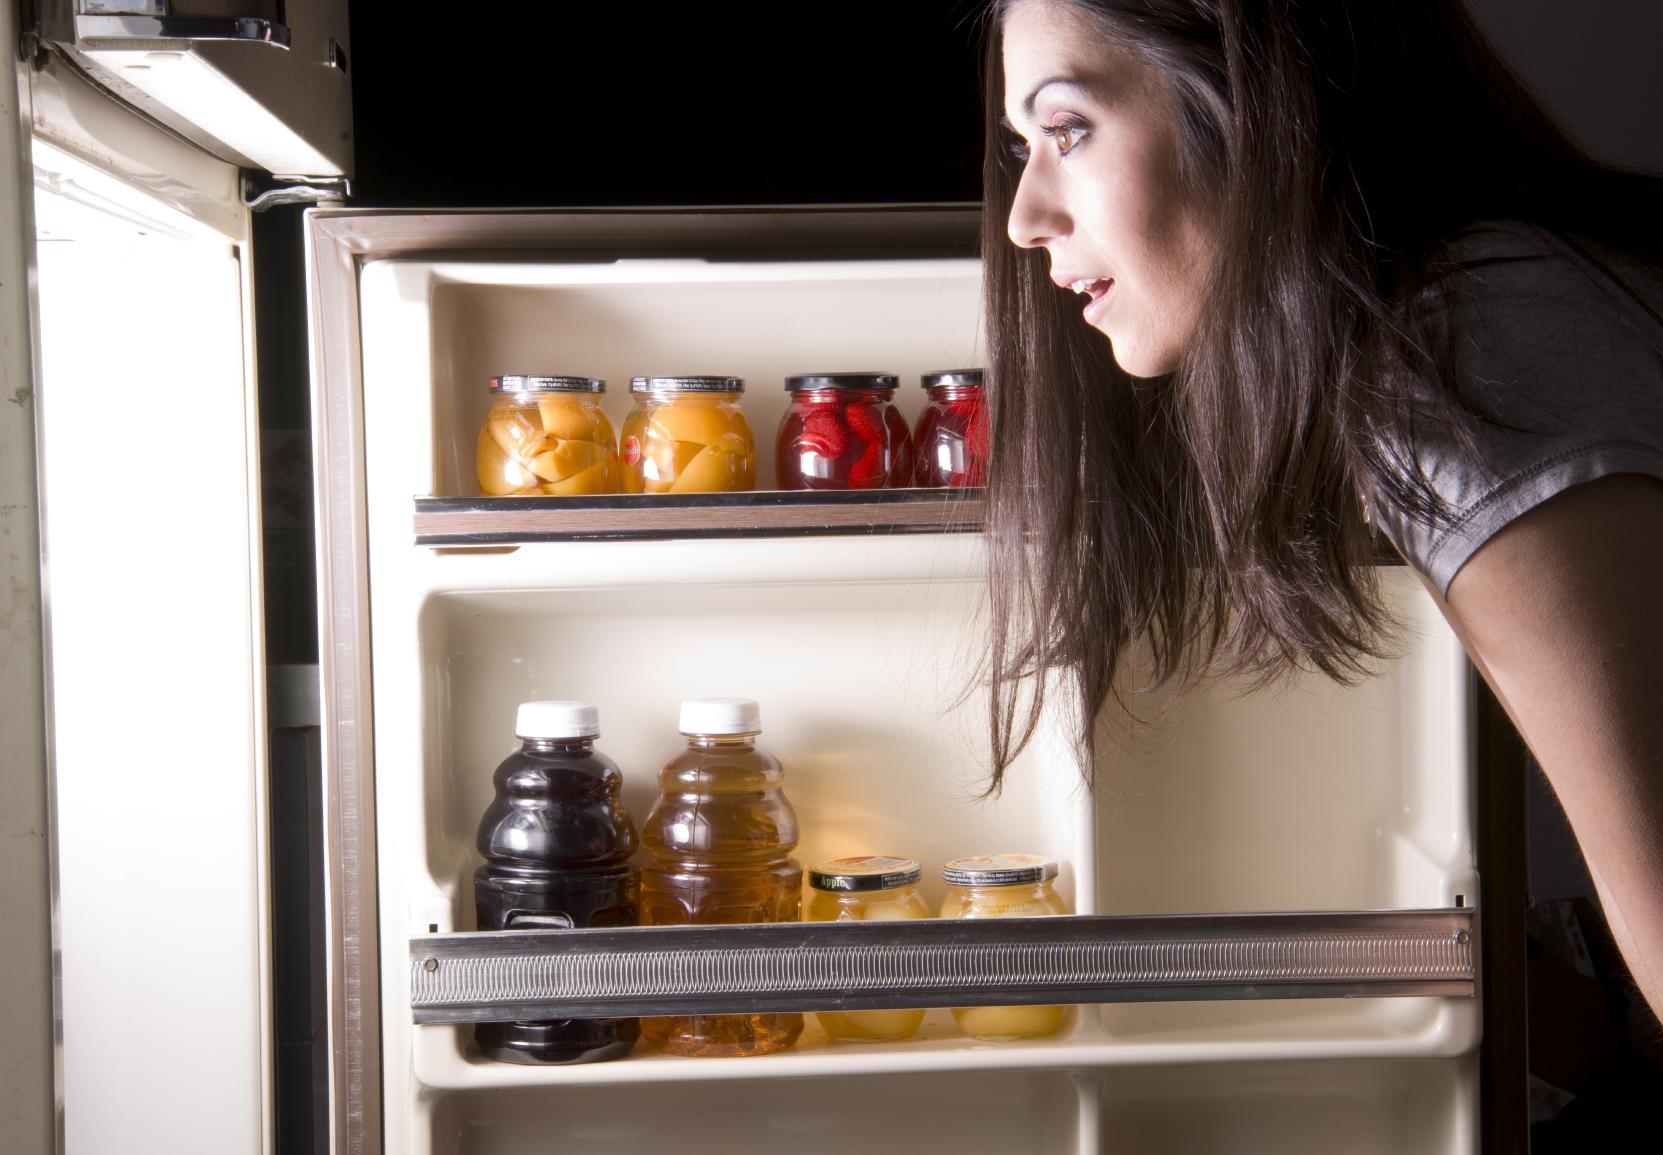 http://www.thegoodsleepexpert.com/wp-content/uploads/2013/10/iStock_000018988610Medium-fridge.jpg